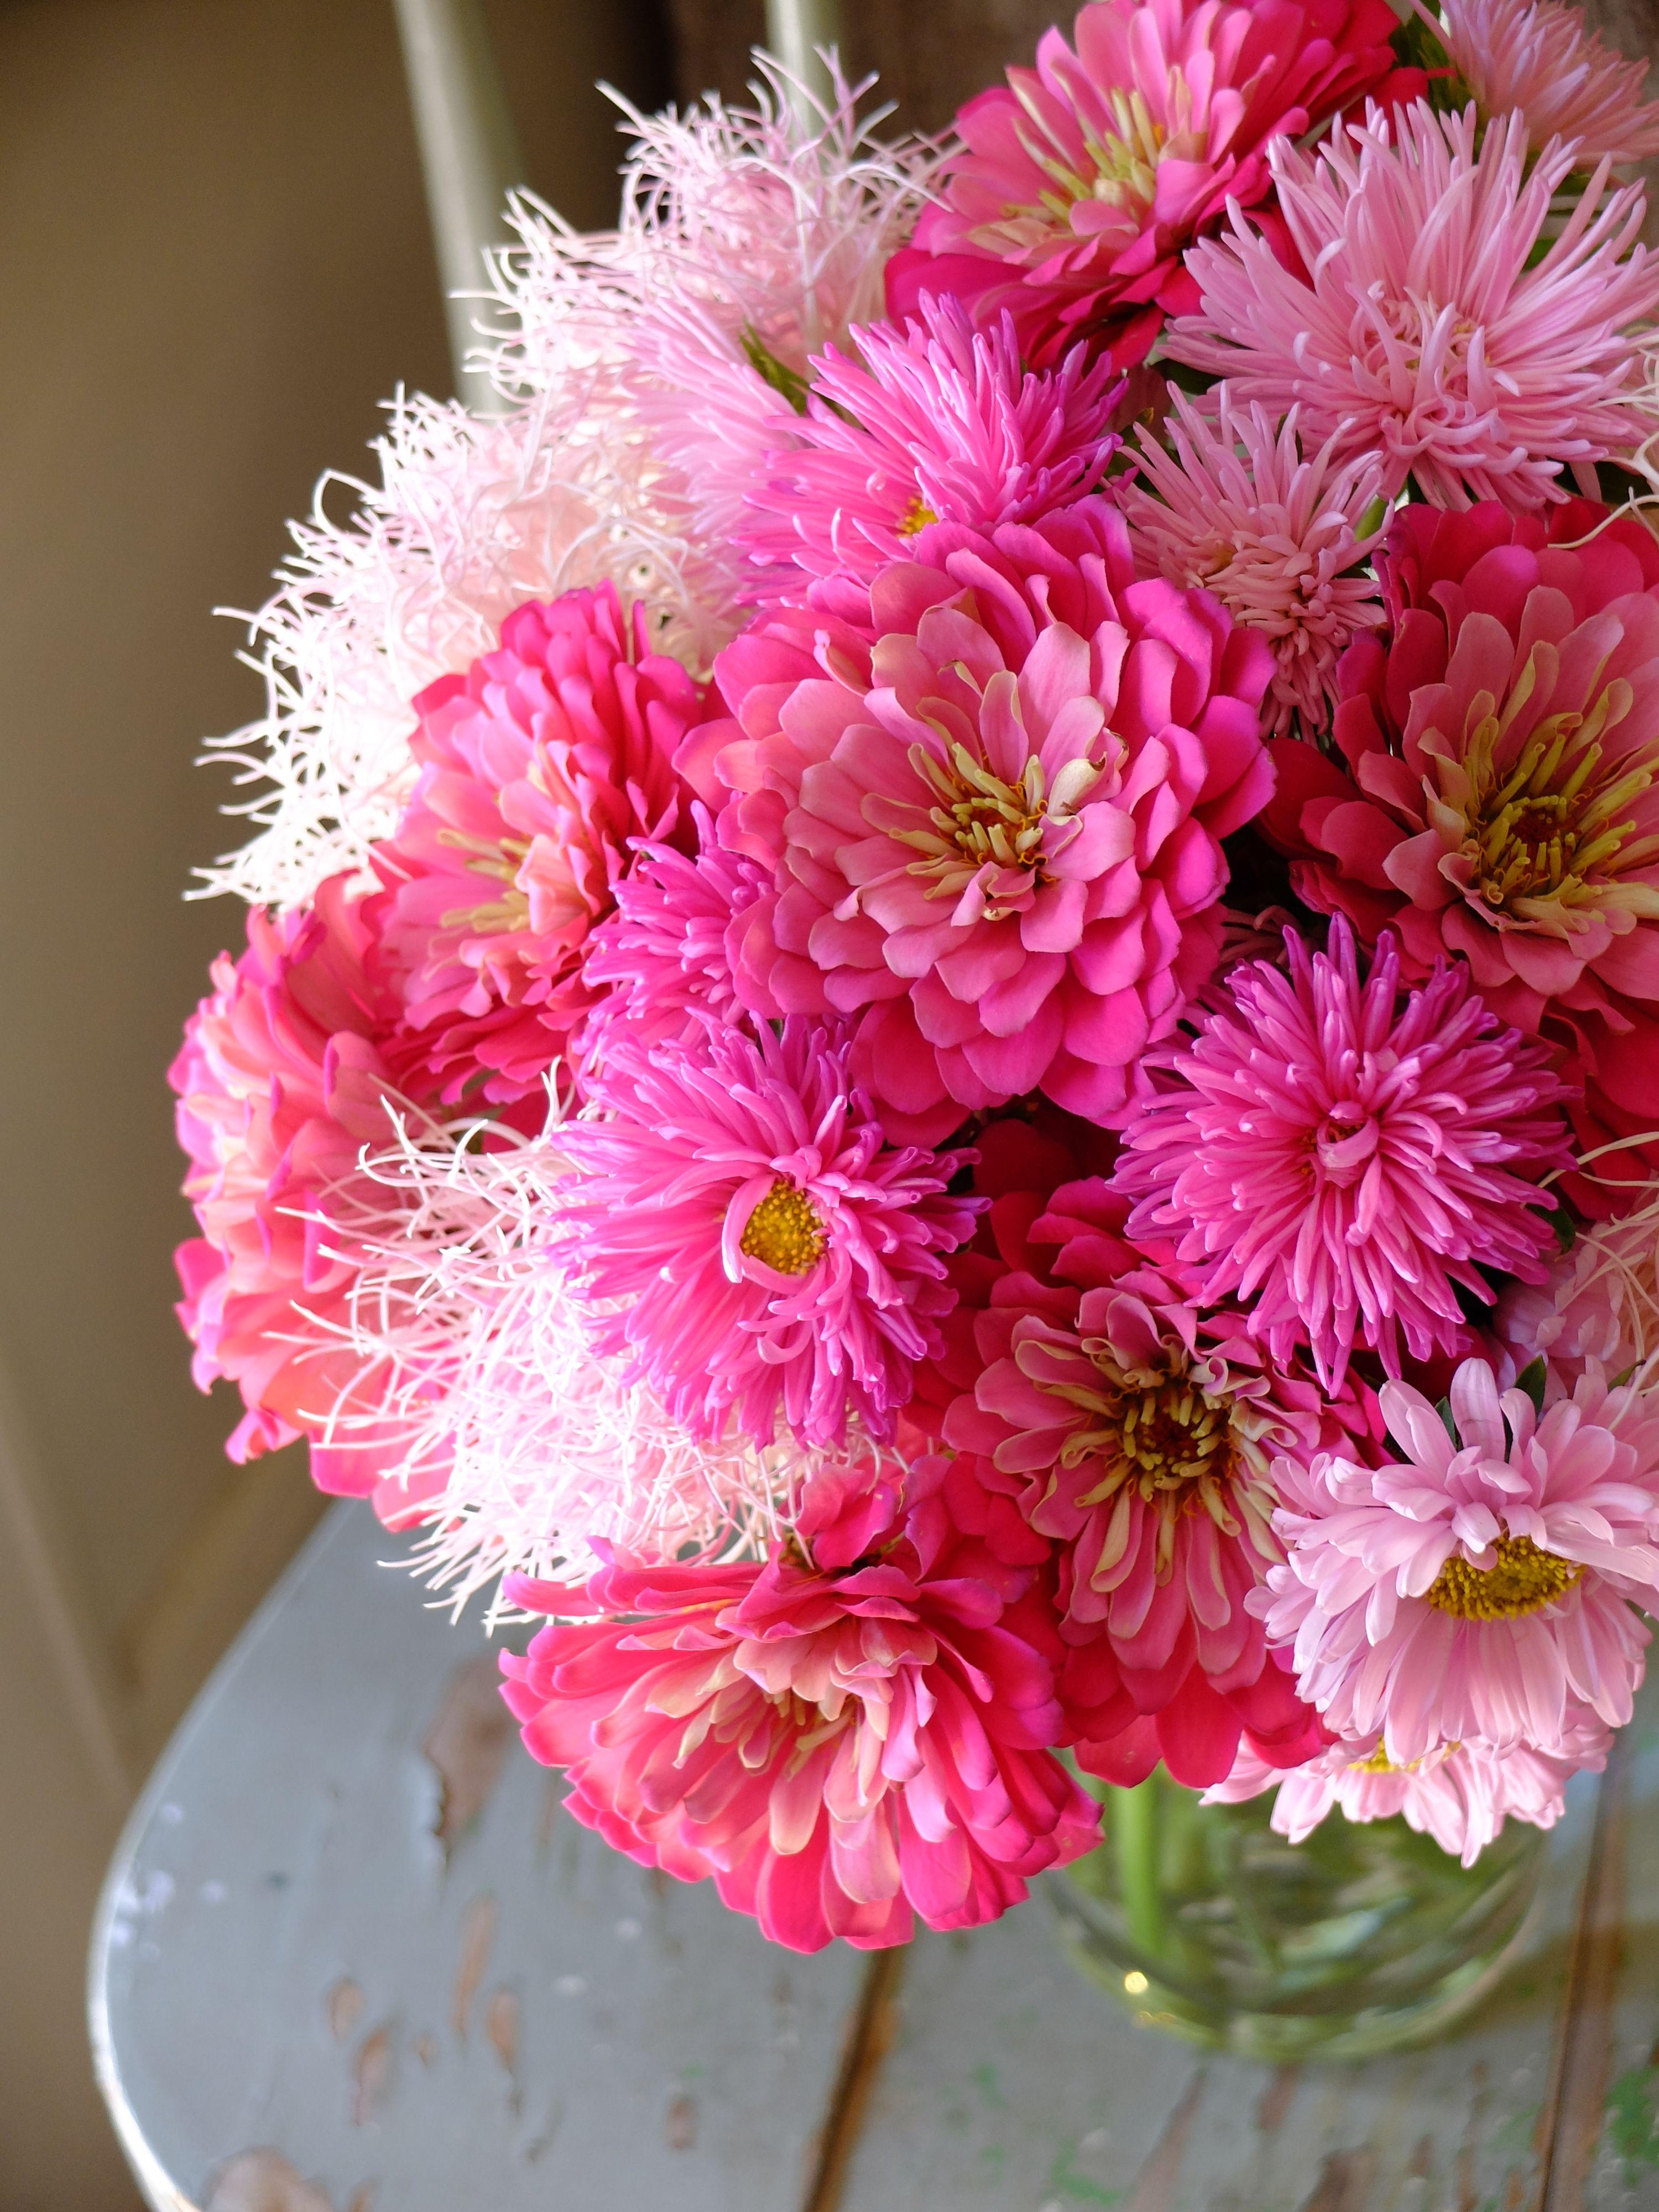 Zinnia China Aster And Mum Flower Arrangements Everyday Bouquet Pink Flowers